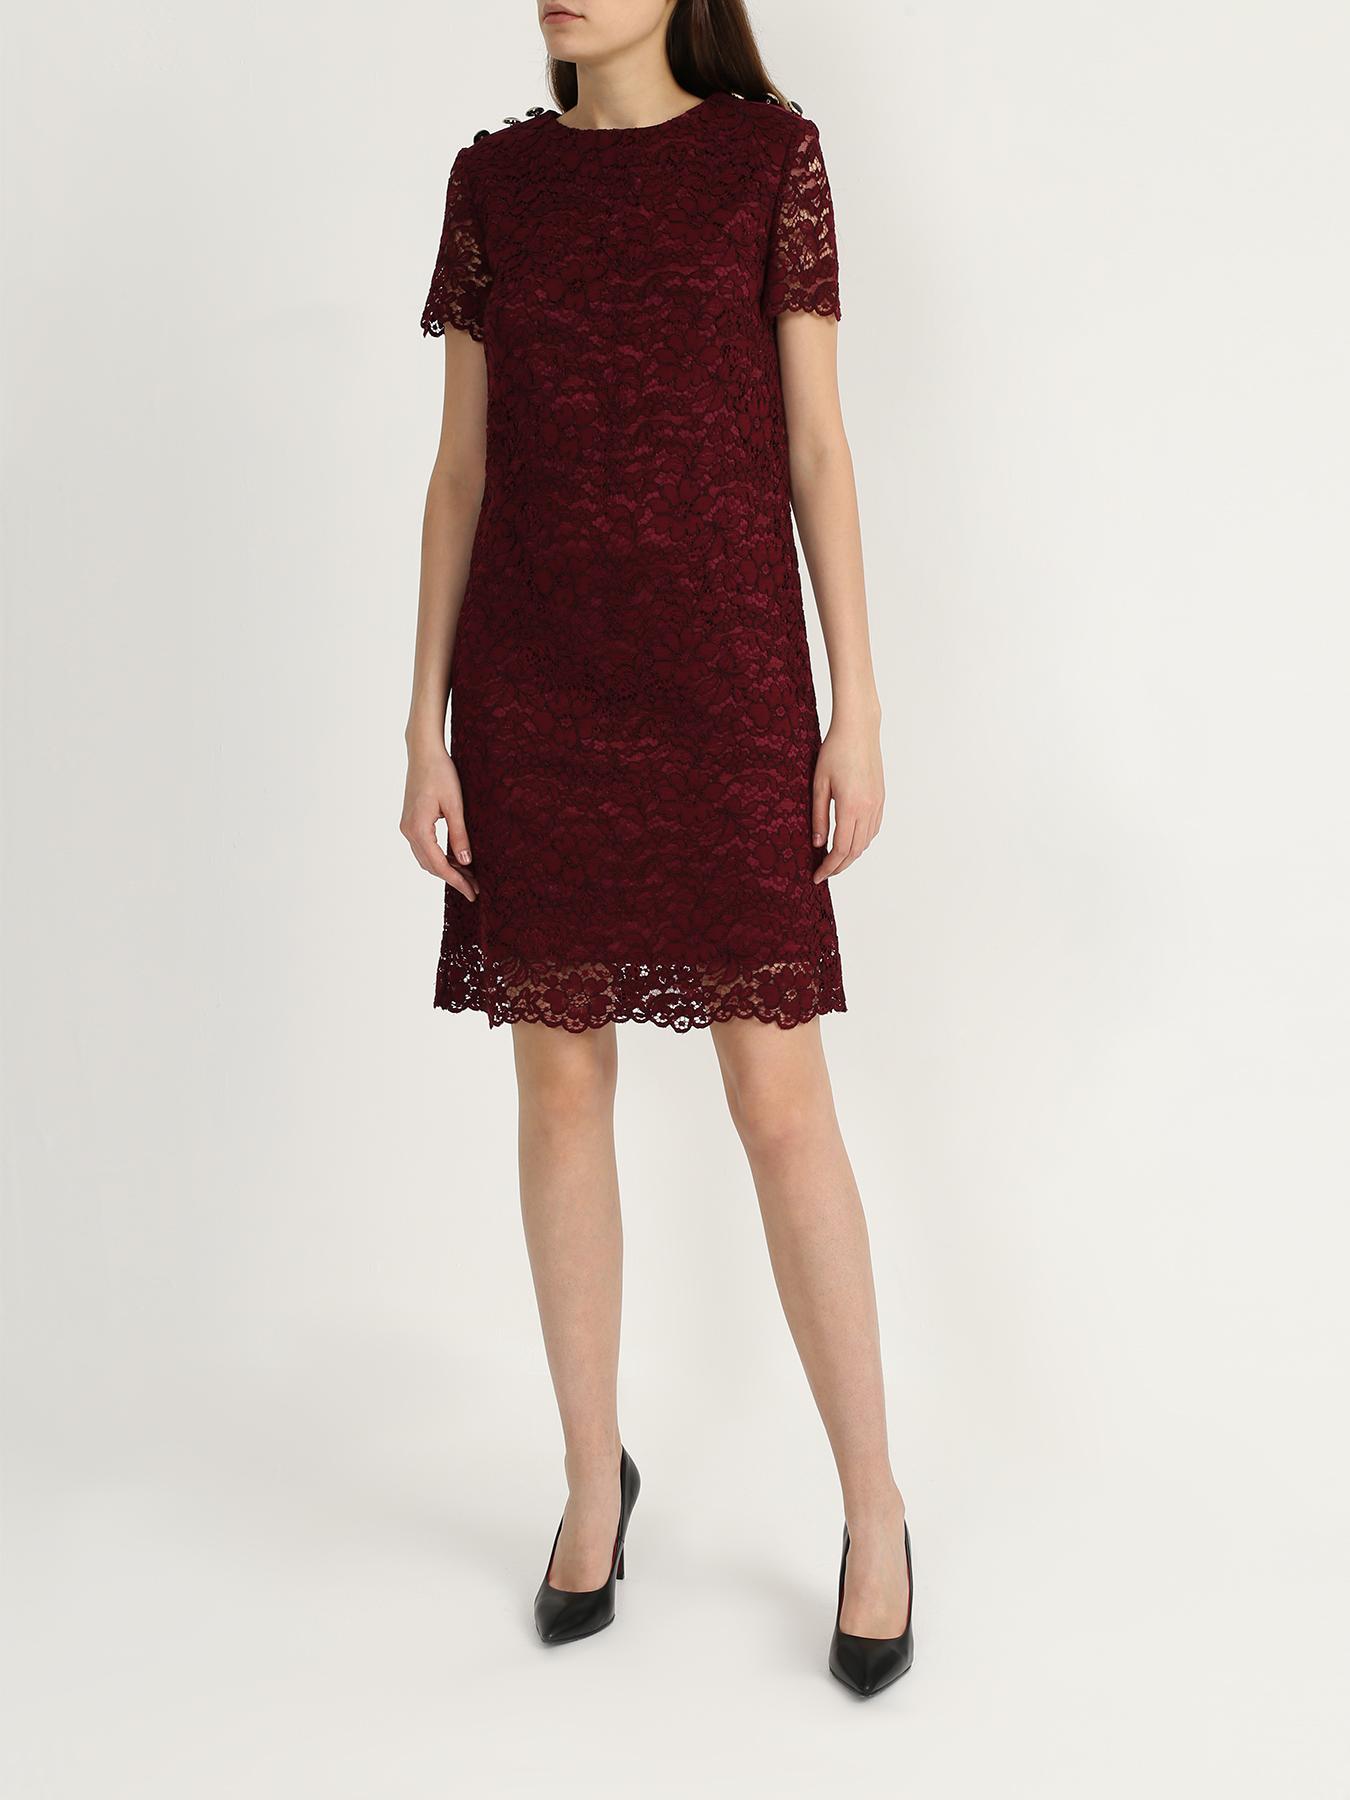 Платье Korpo Платье с кружевом